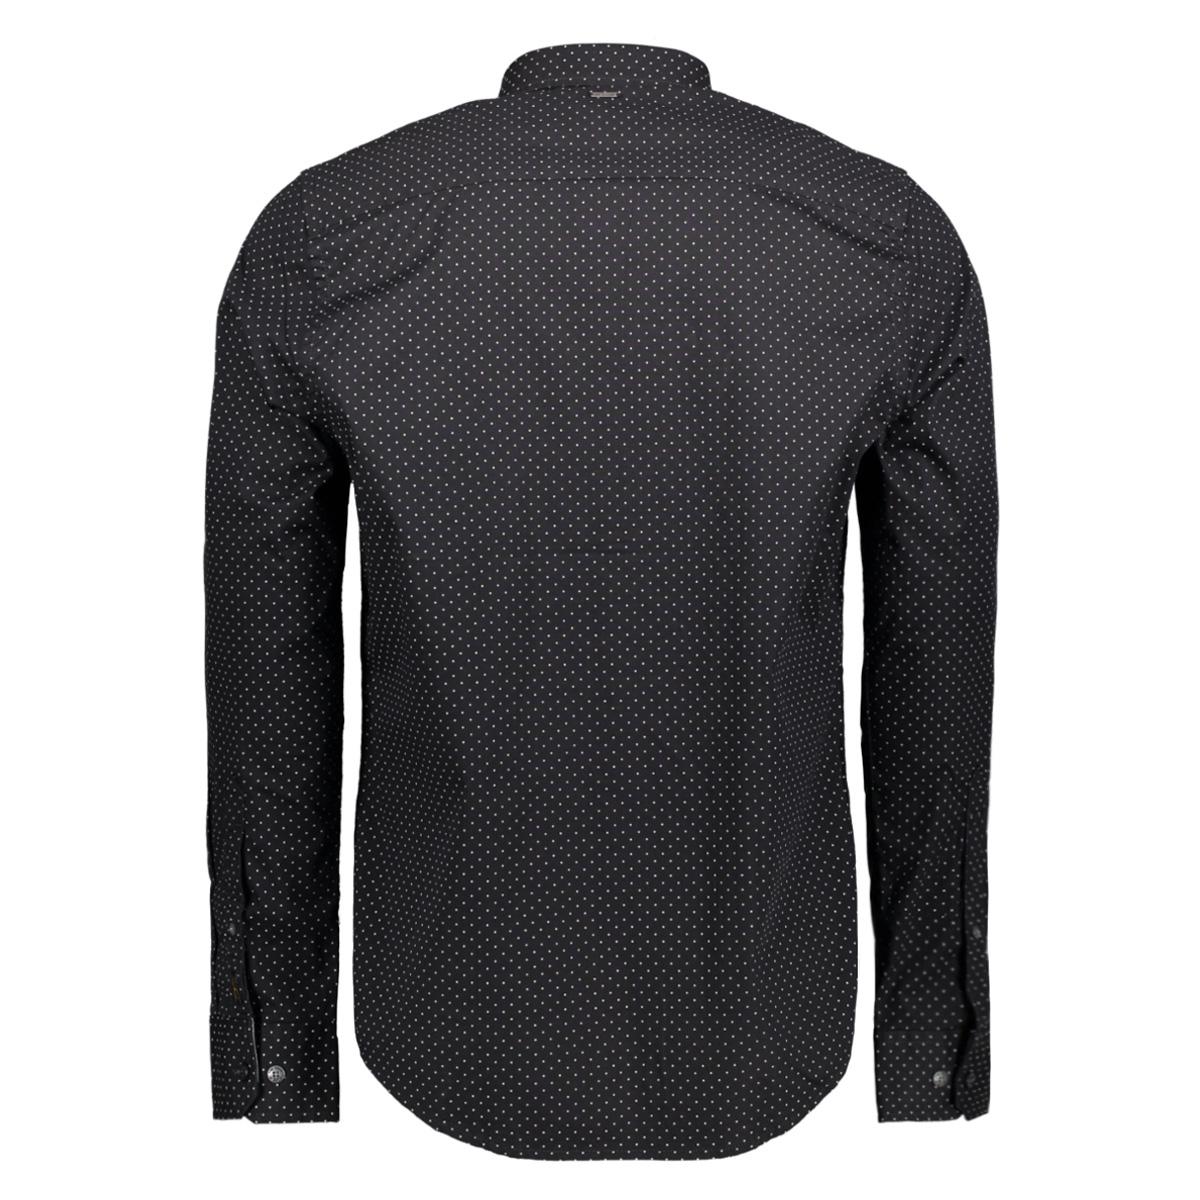 psi178223 pme legend overhemd 999